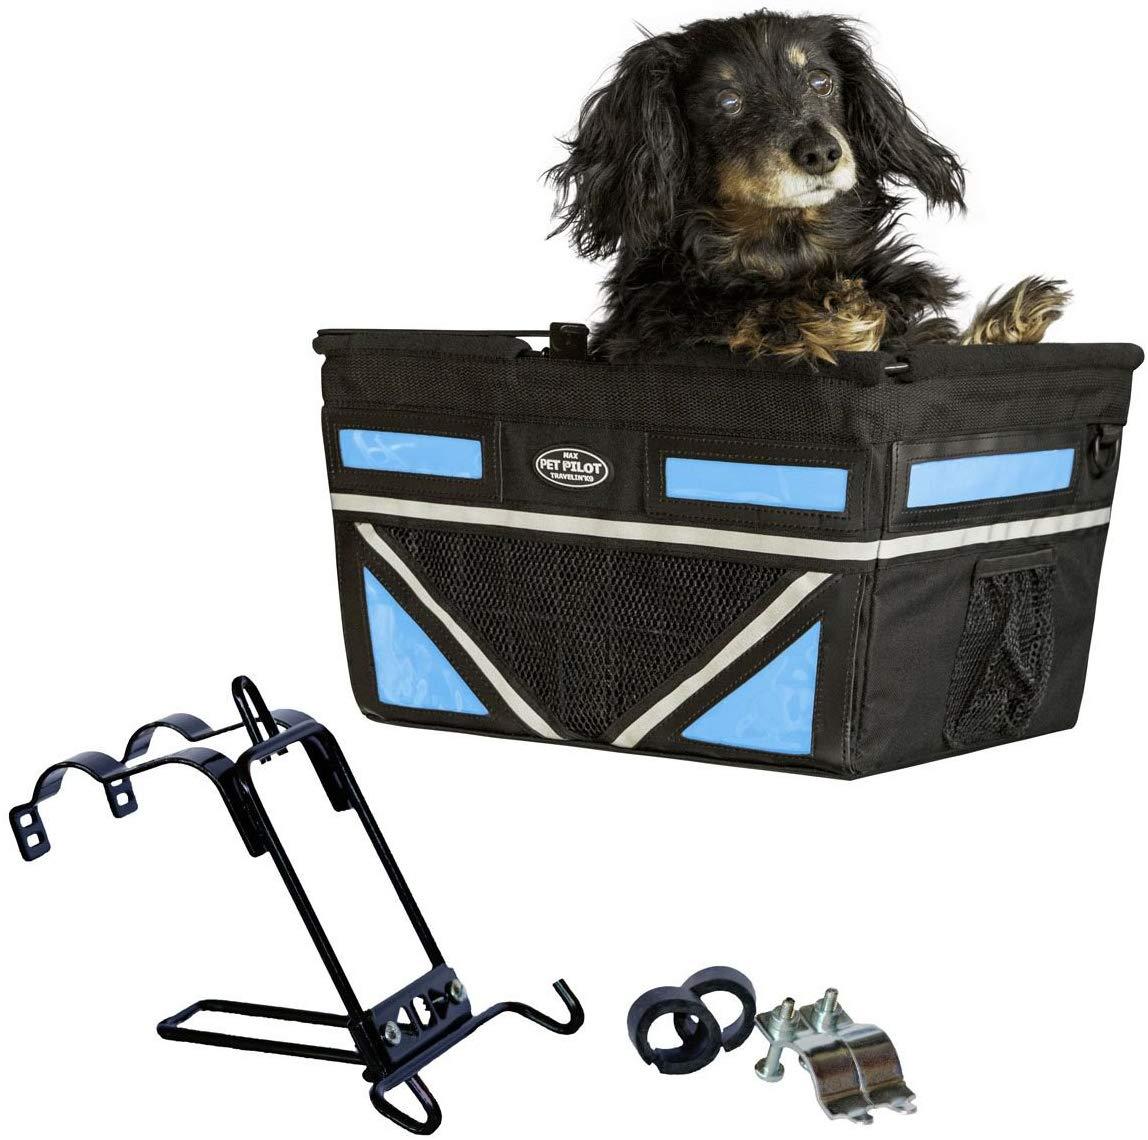 Travelin K9 2019 Pet-Pilot MAX Large Bike Basket for Dogs & Cats, Neon Blue